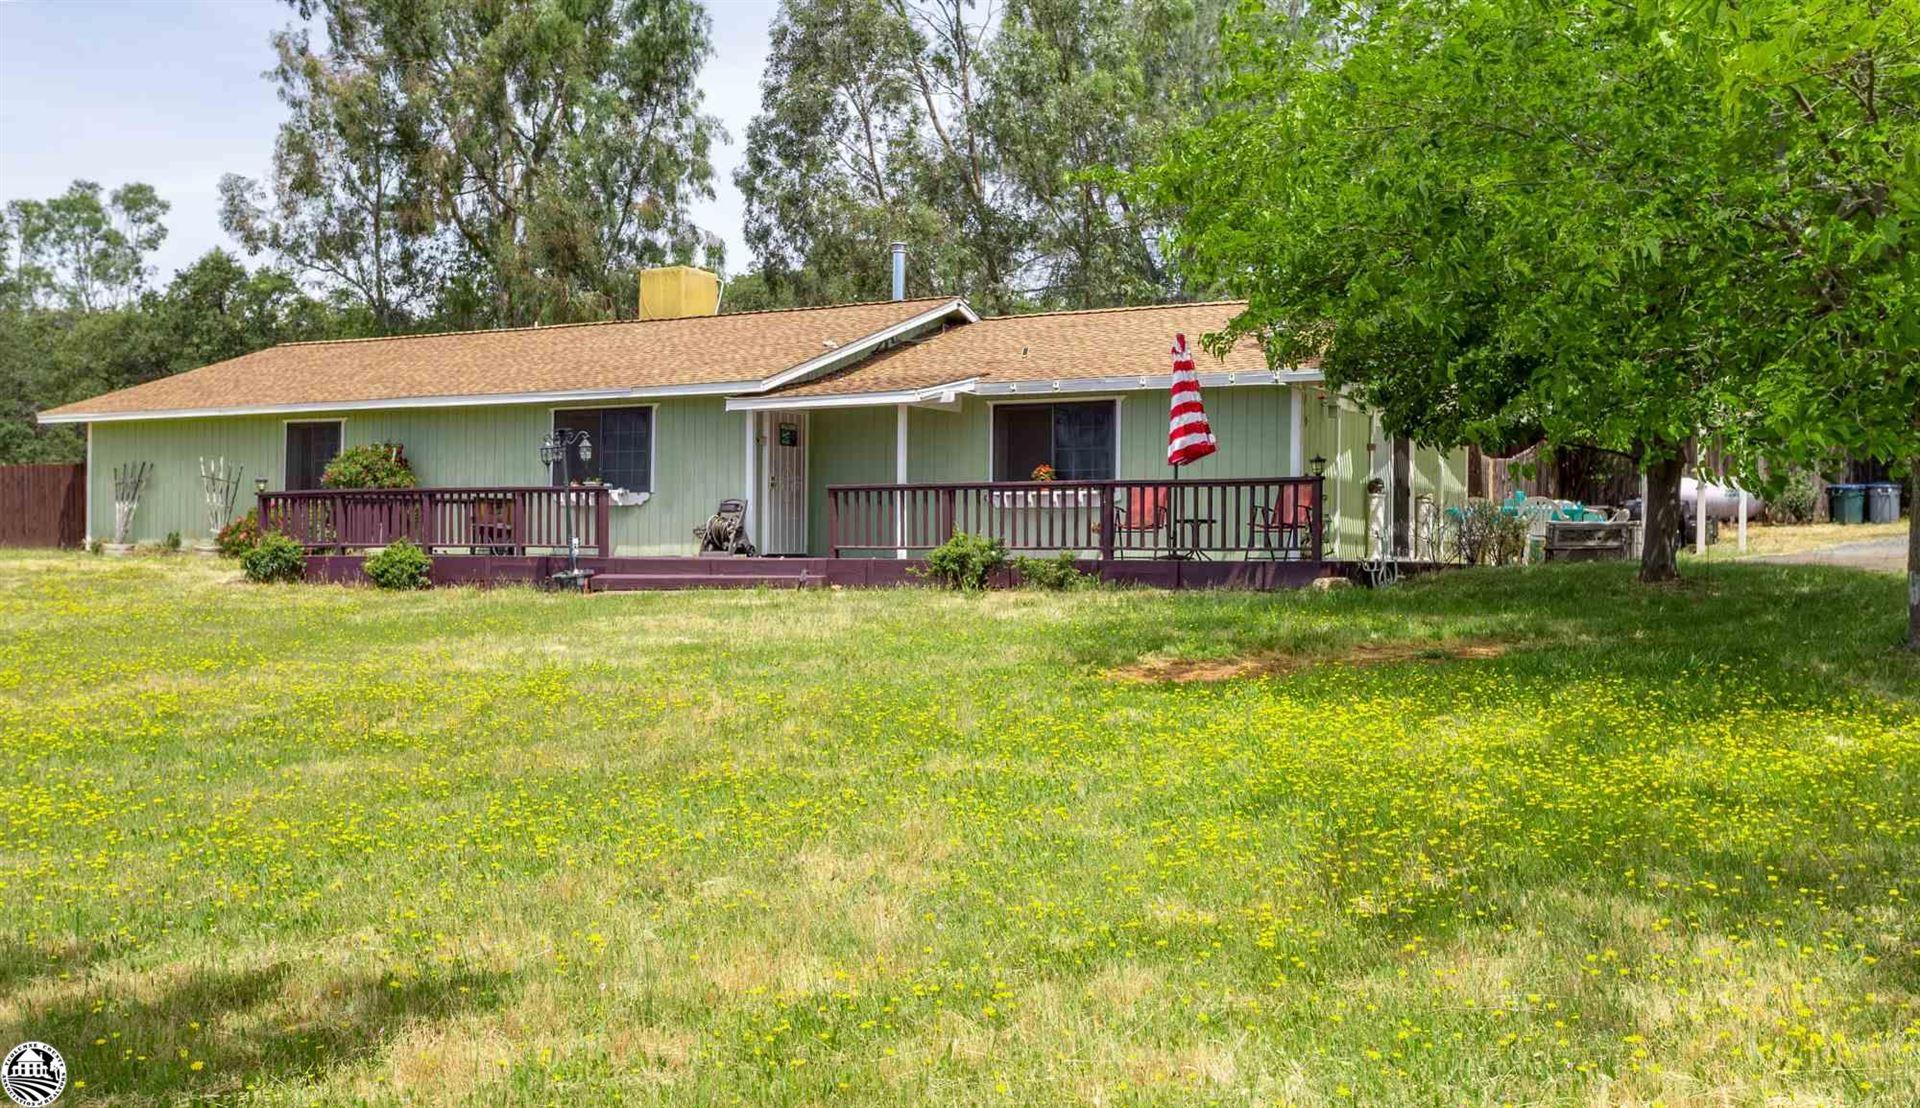 3287 Granite Springs Road Road, Coulterville, CA 95311 - #: 20200659